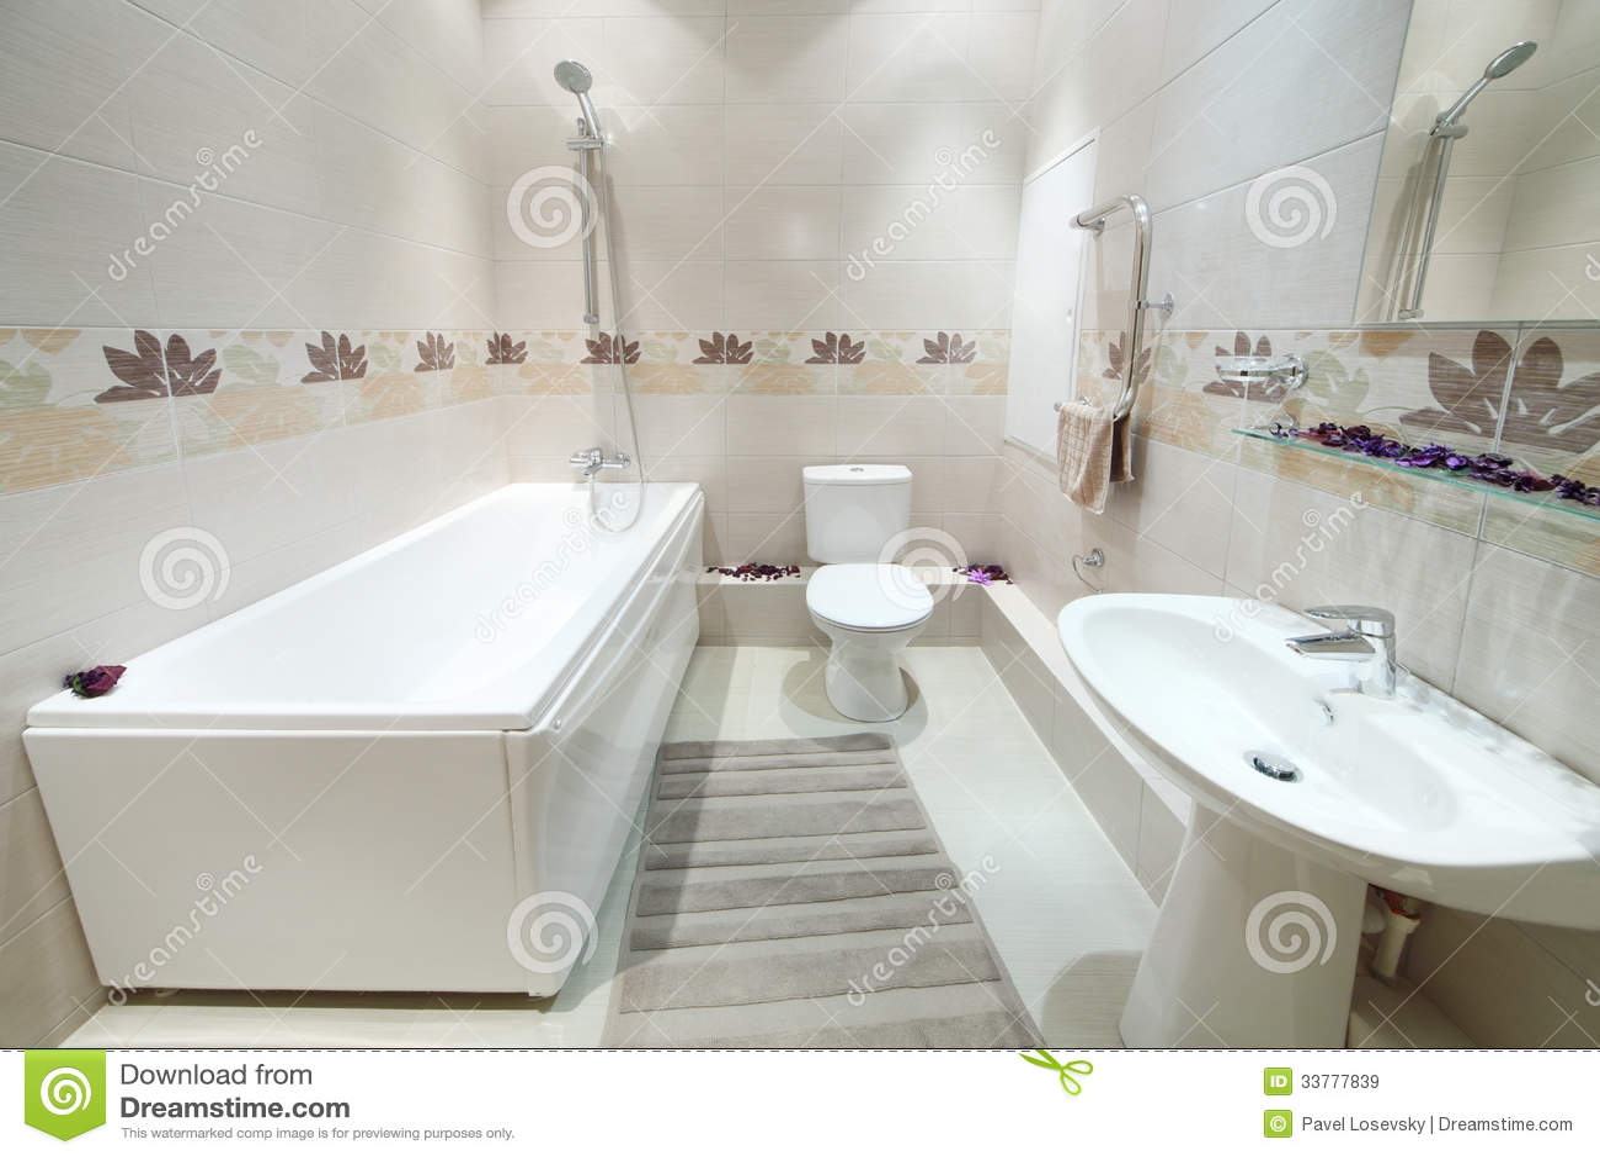 Clean Bathroom Walls How To Clean Mold Off Of Bathroom Walls